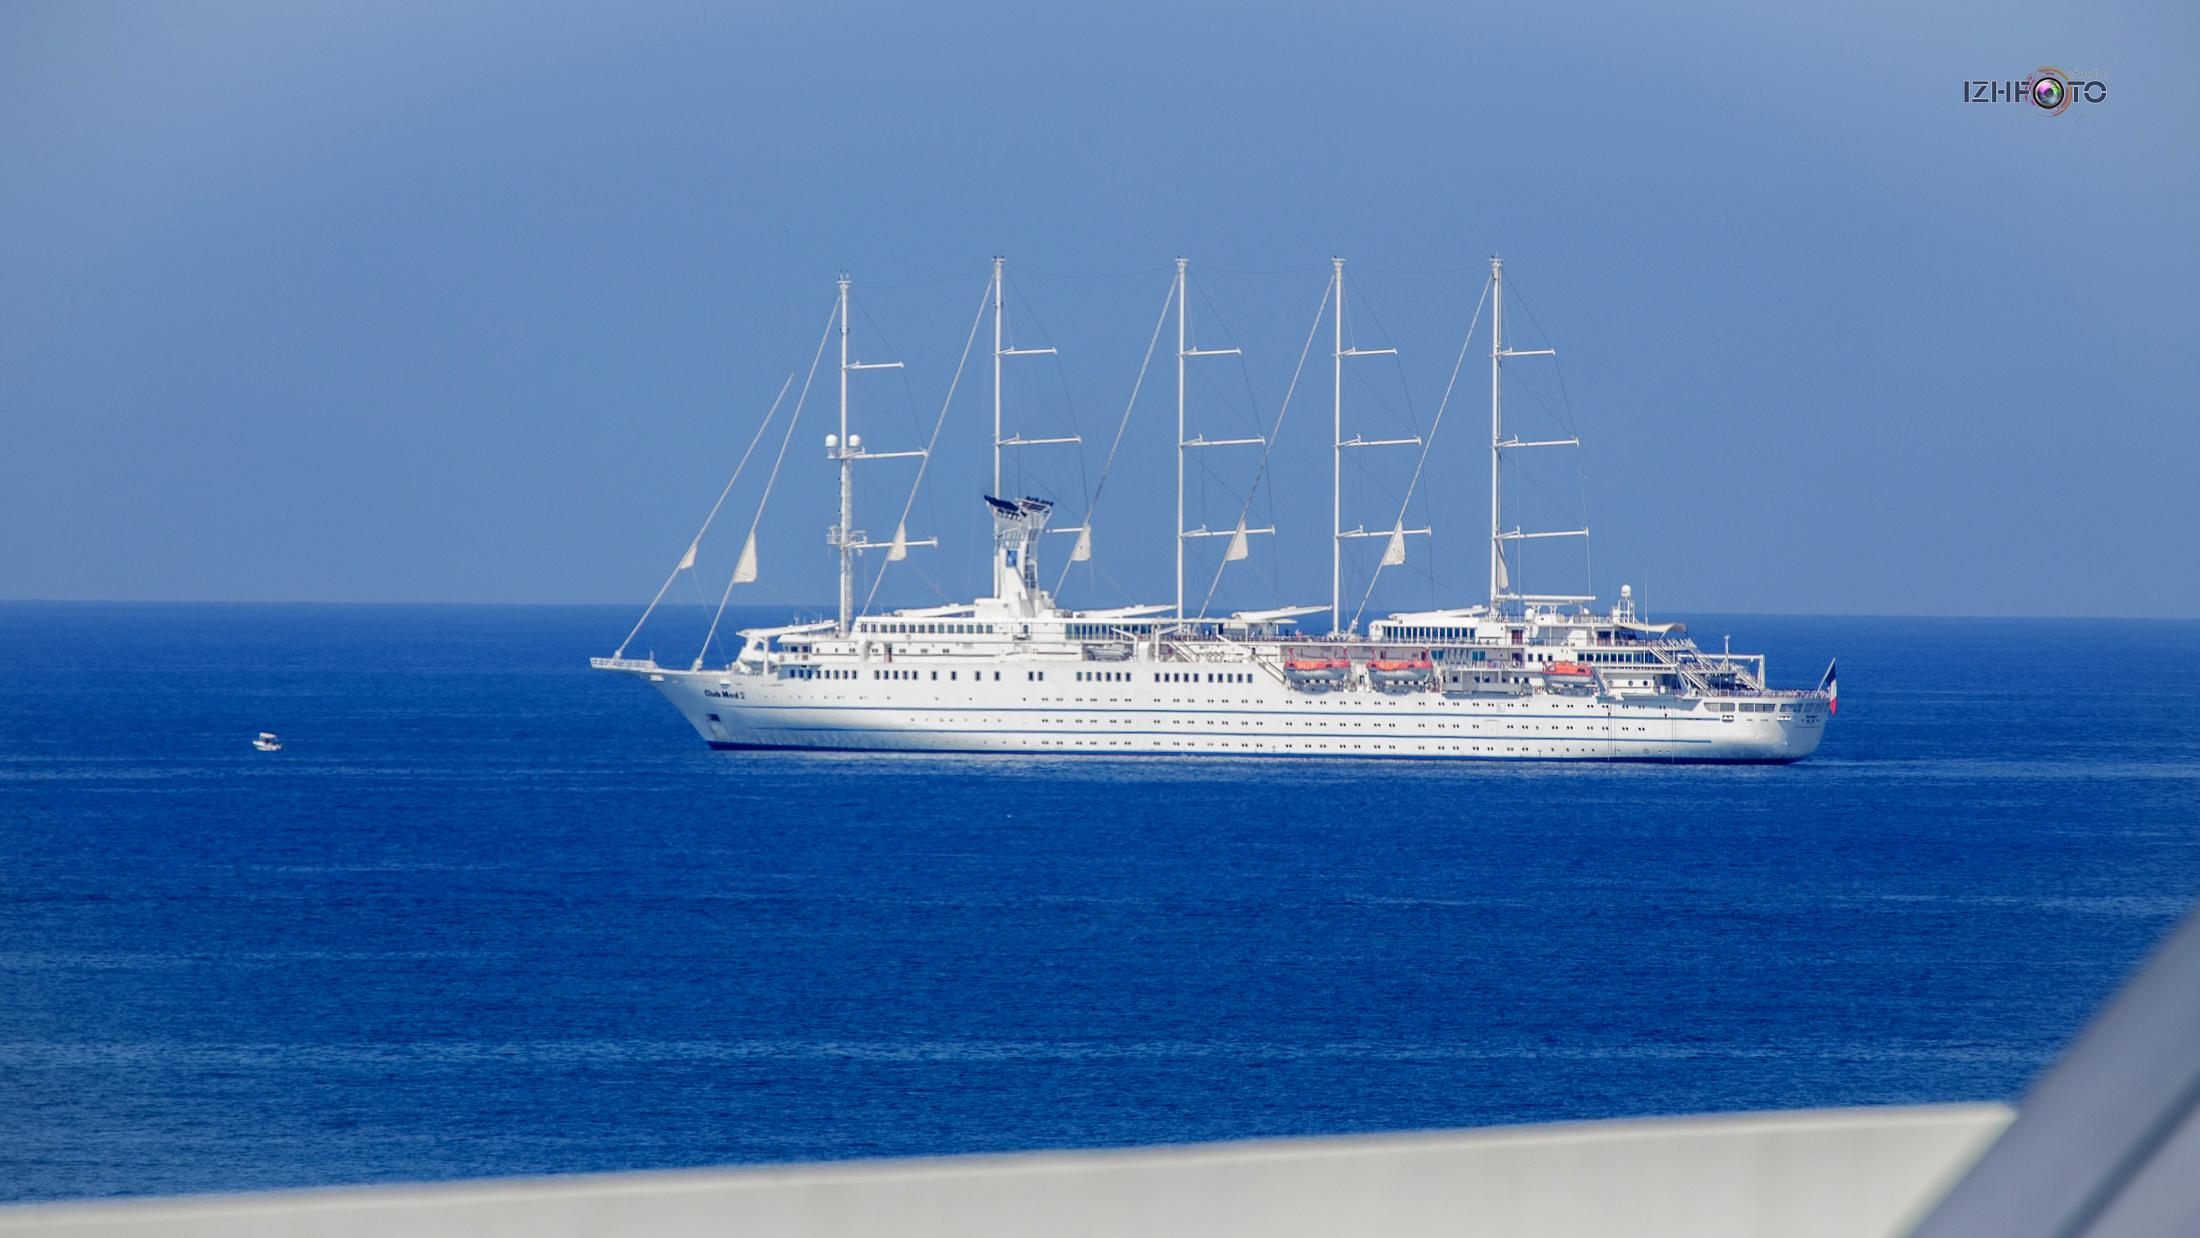 Пяти мачтовый парусник Club Med 2 Фото